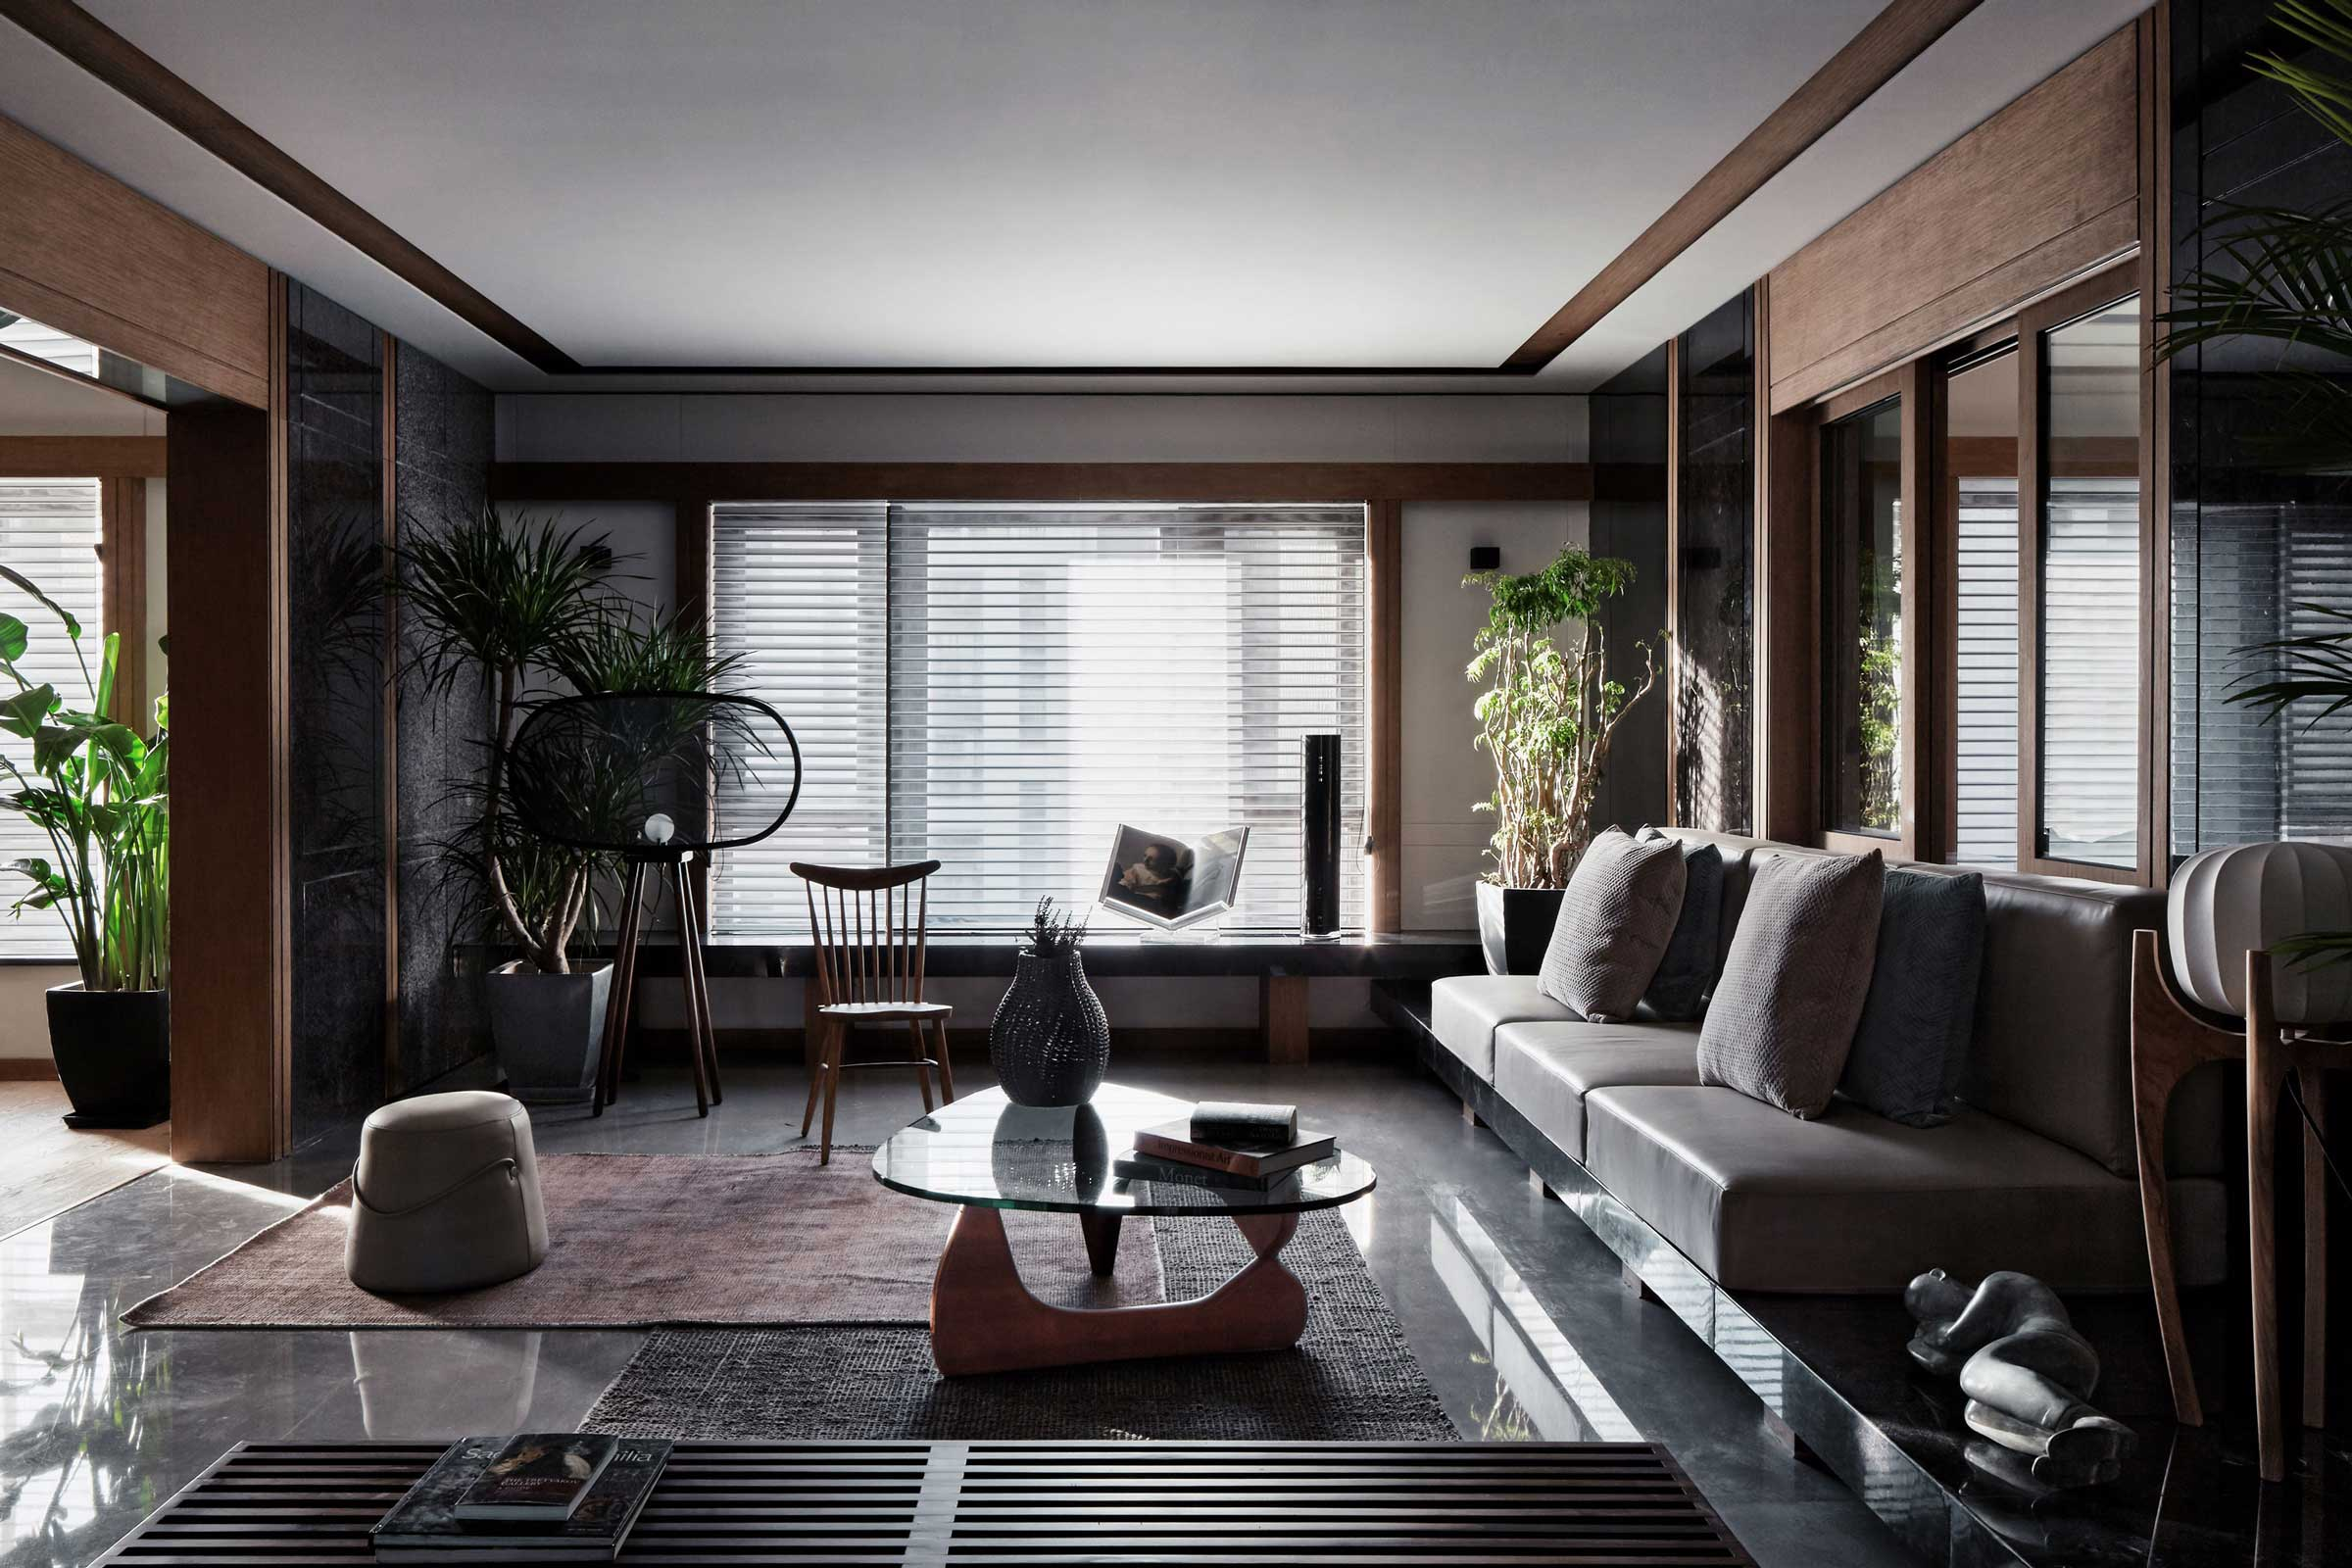 lane-house-ARCHISTRY-nolan-chao-02-living-room.jpg